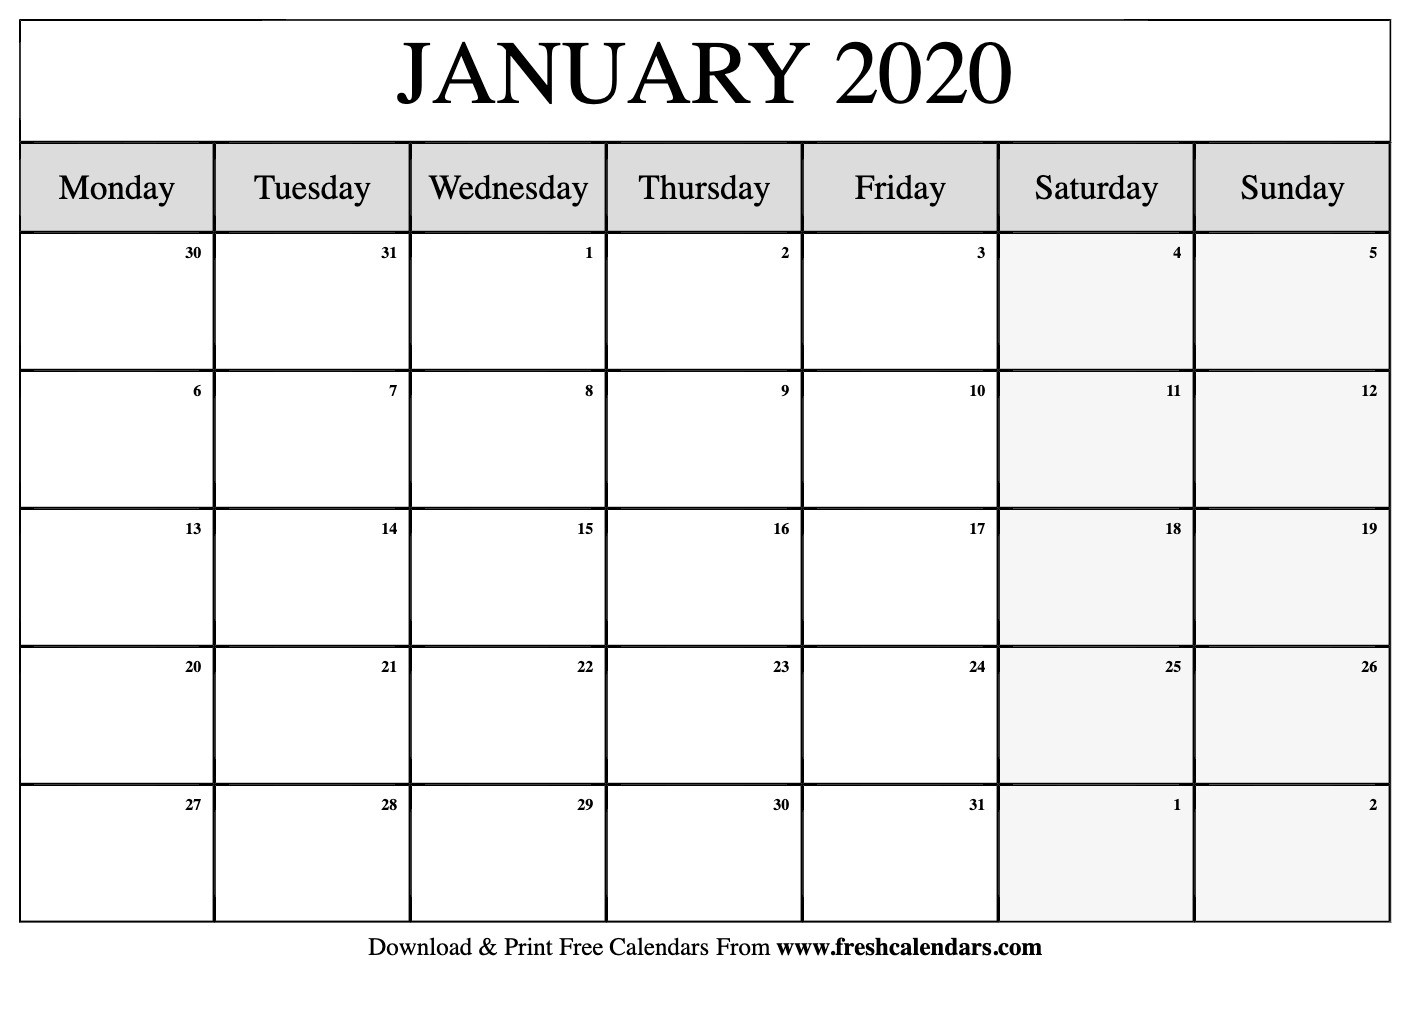 January 2020 Calendar Printable - Fresh Calendars-January 2020 Calendar Microsoft Word